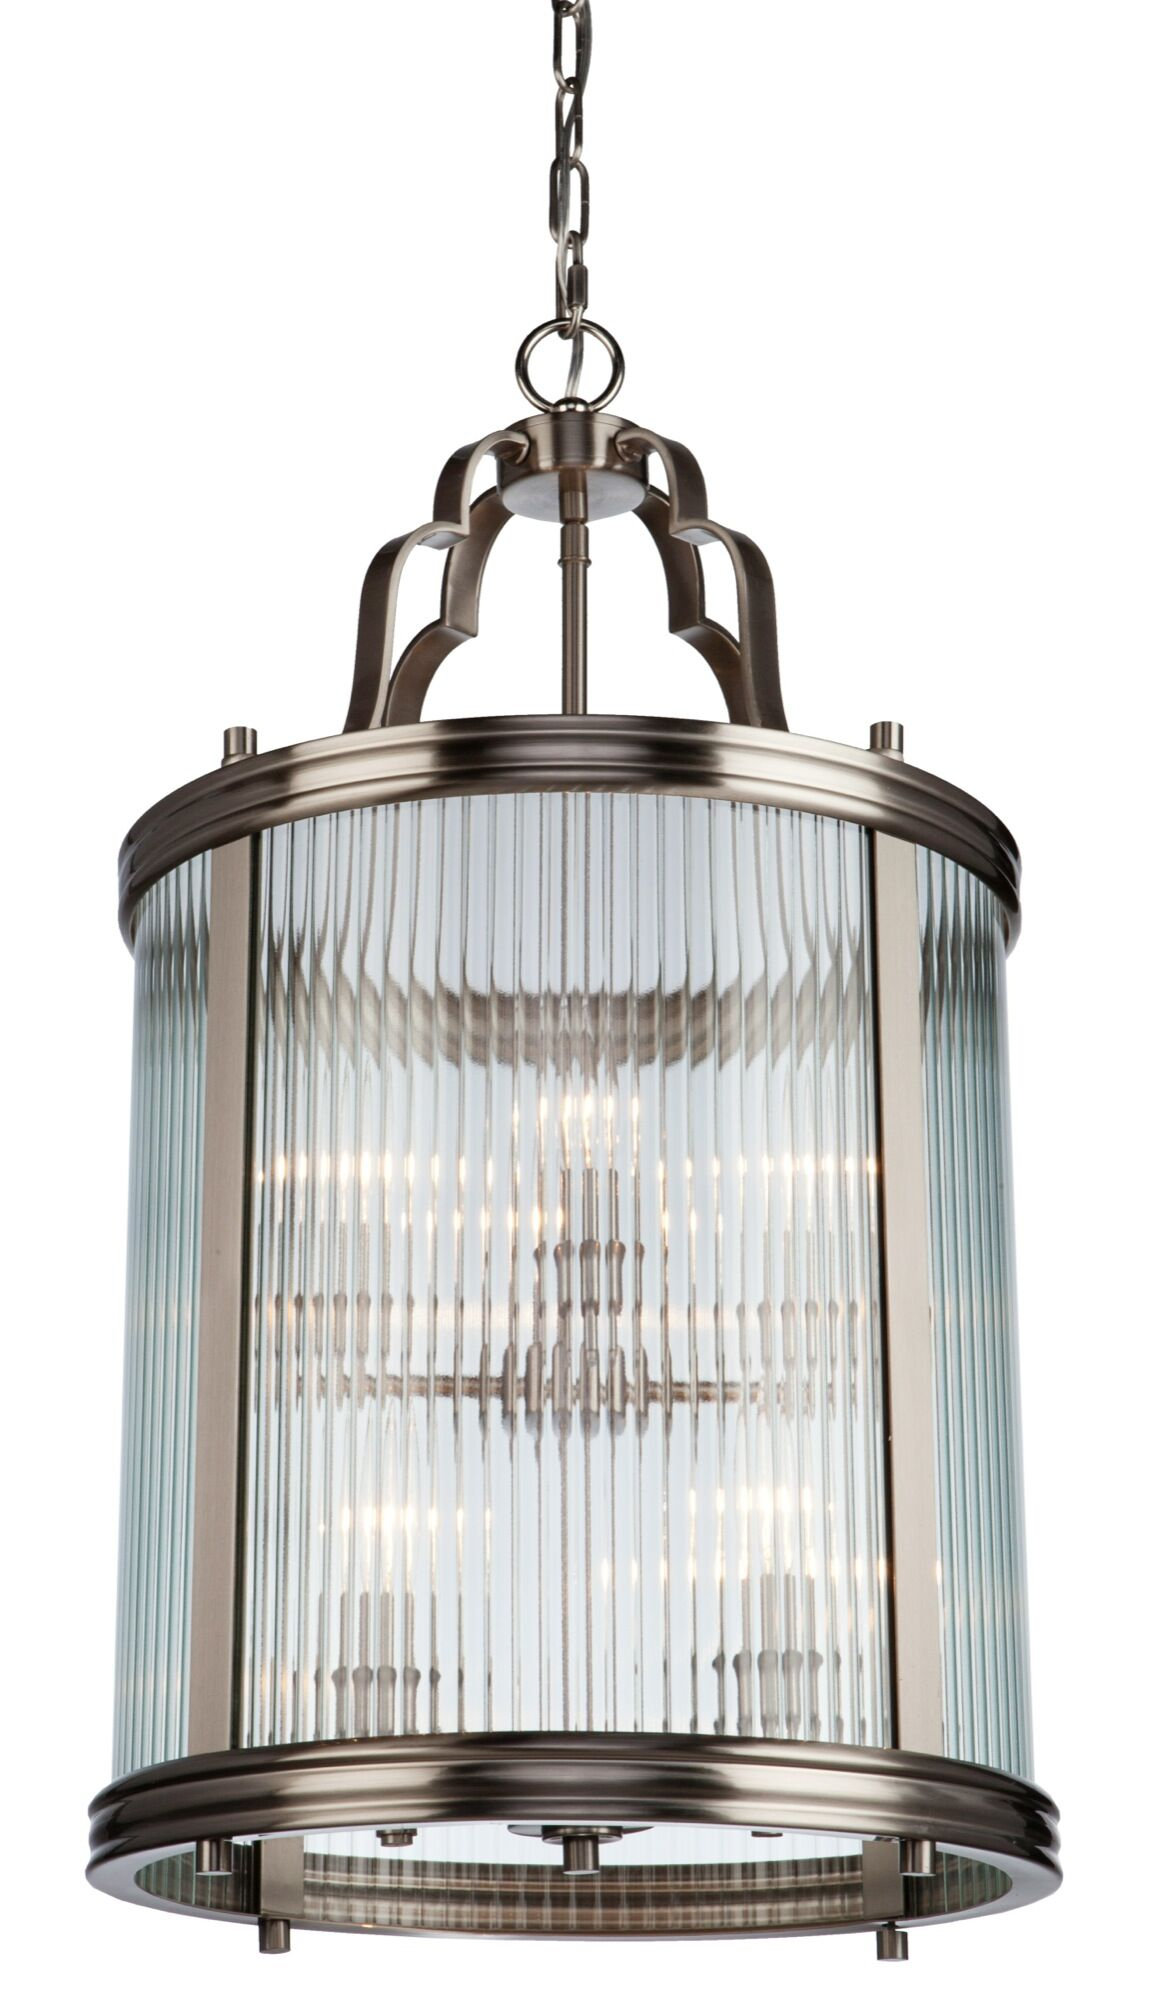 Stratford Lantern Pendant